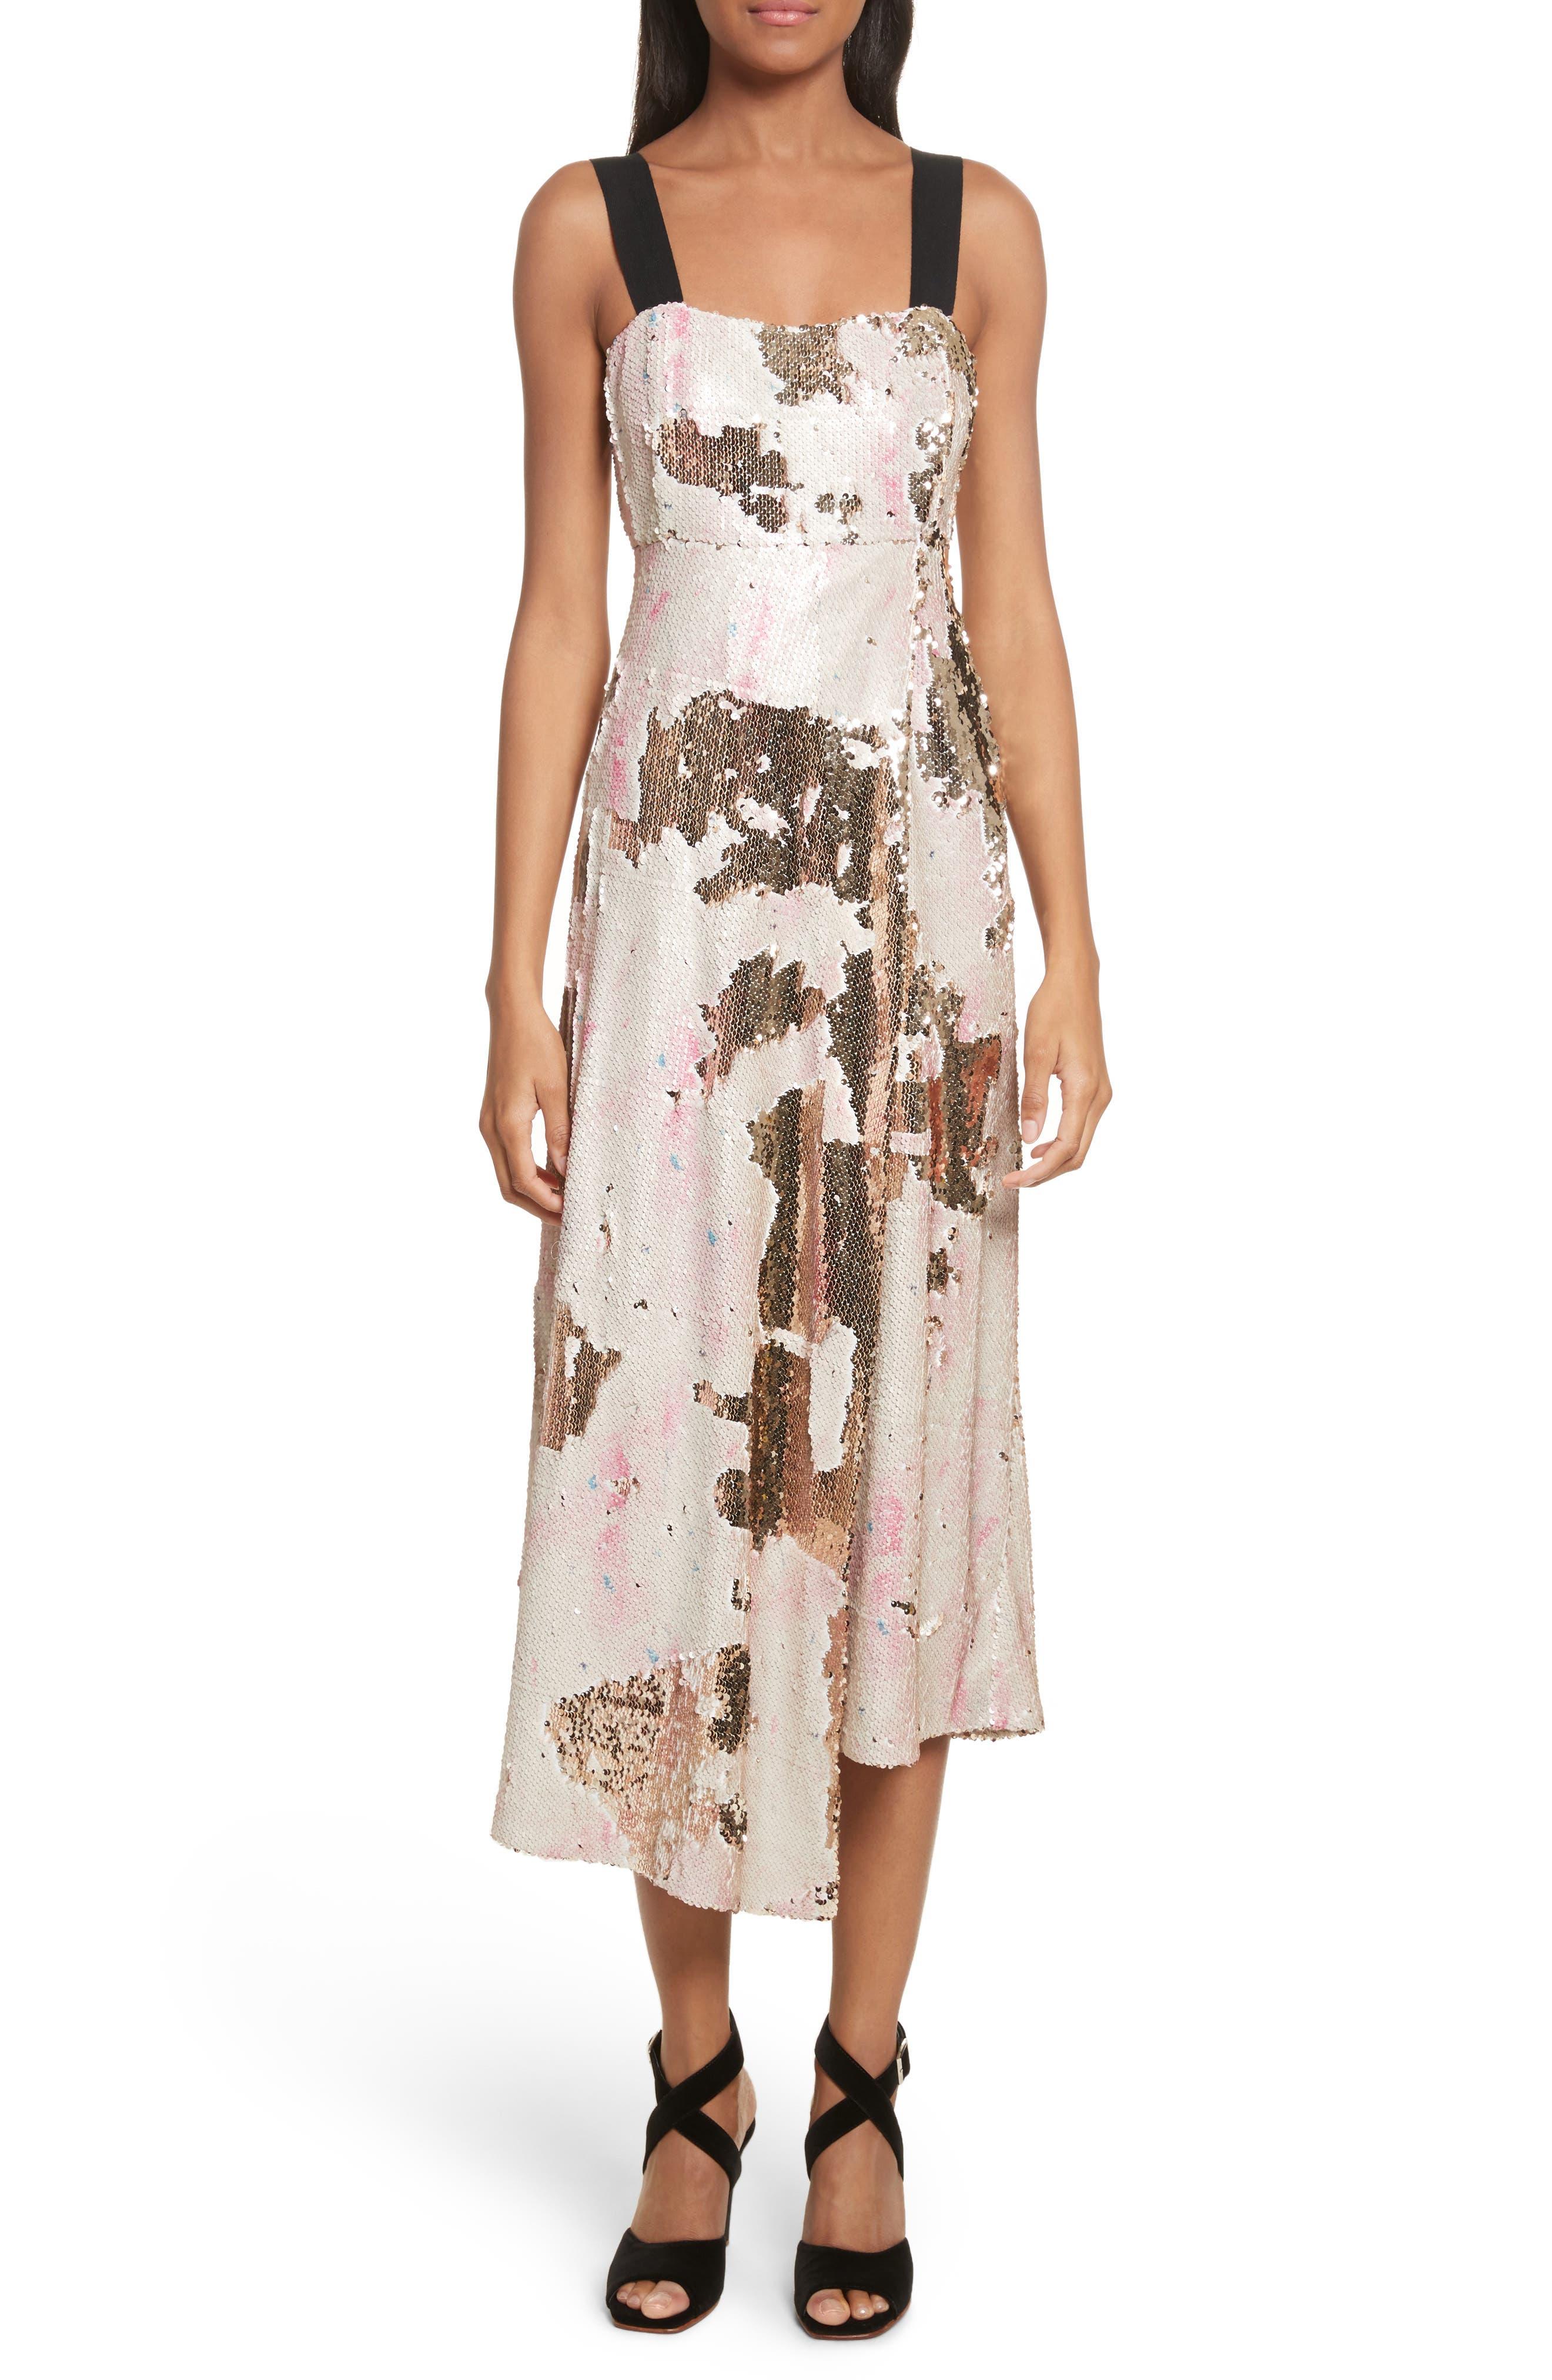 Slacken Sequined Dress,                             Main thumbnail 1, color,                             658